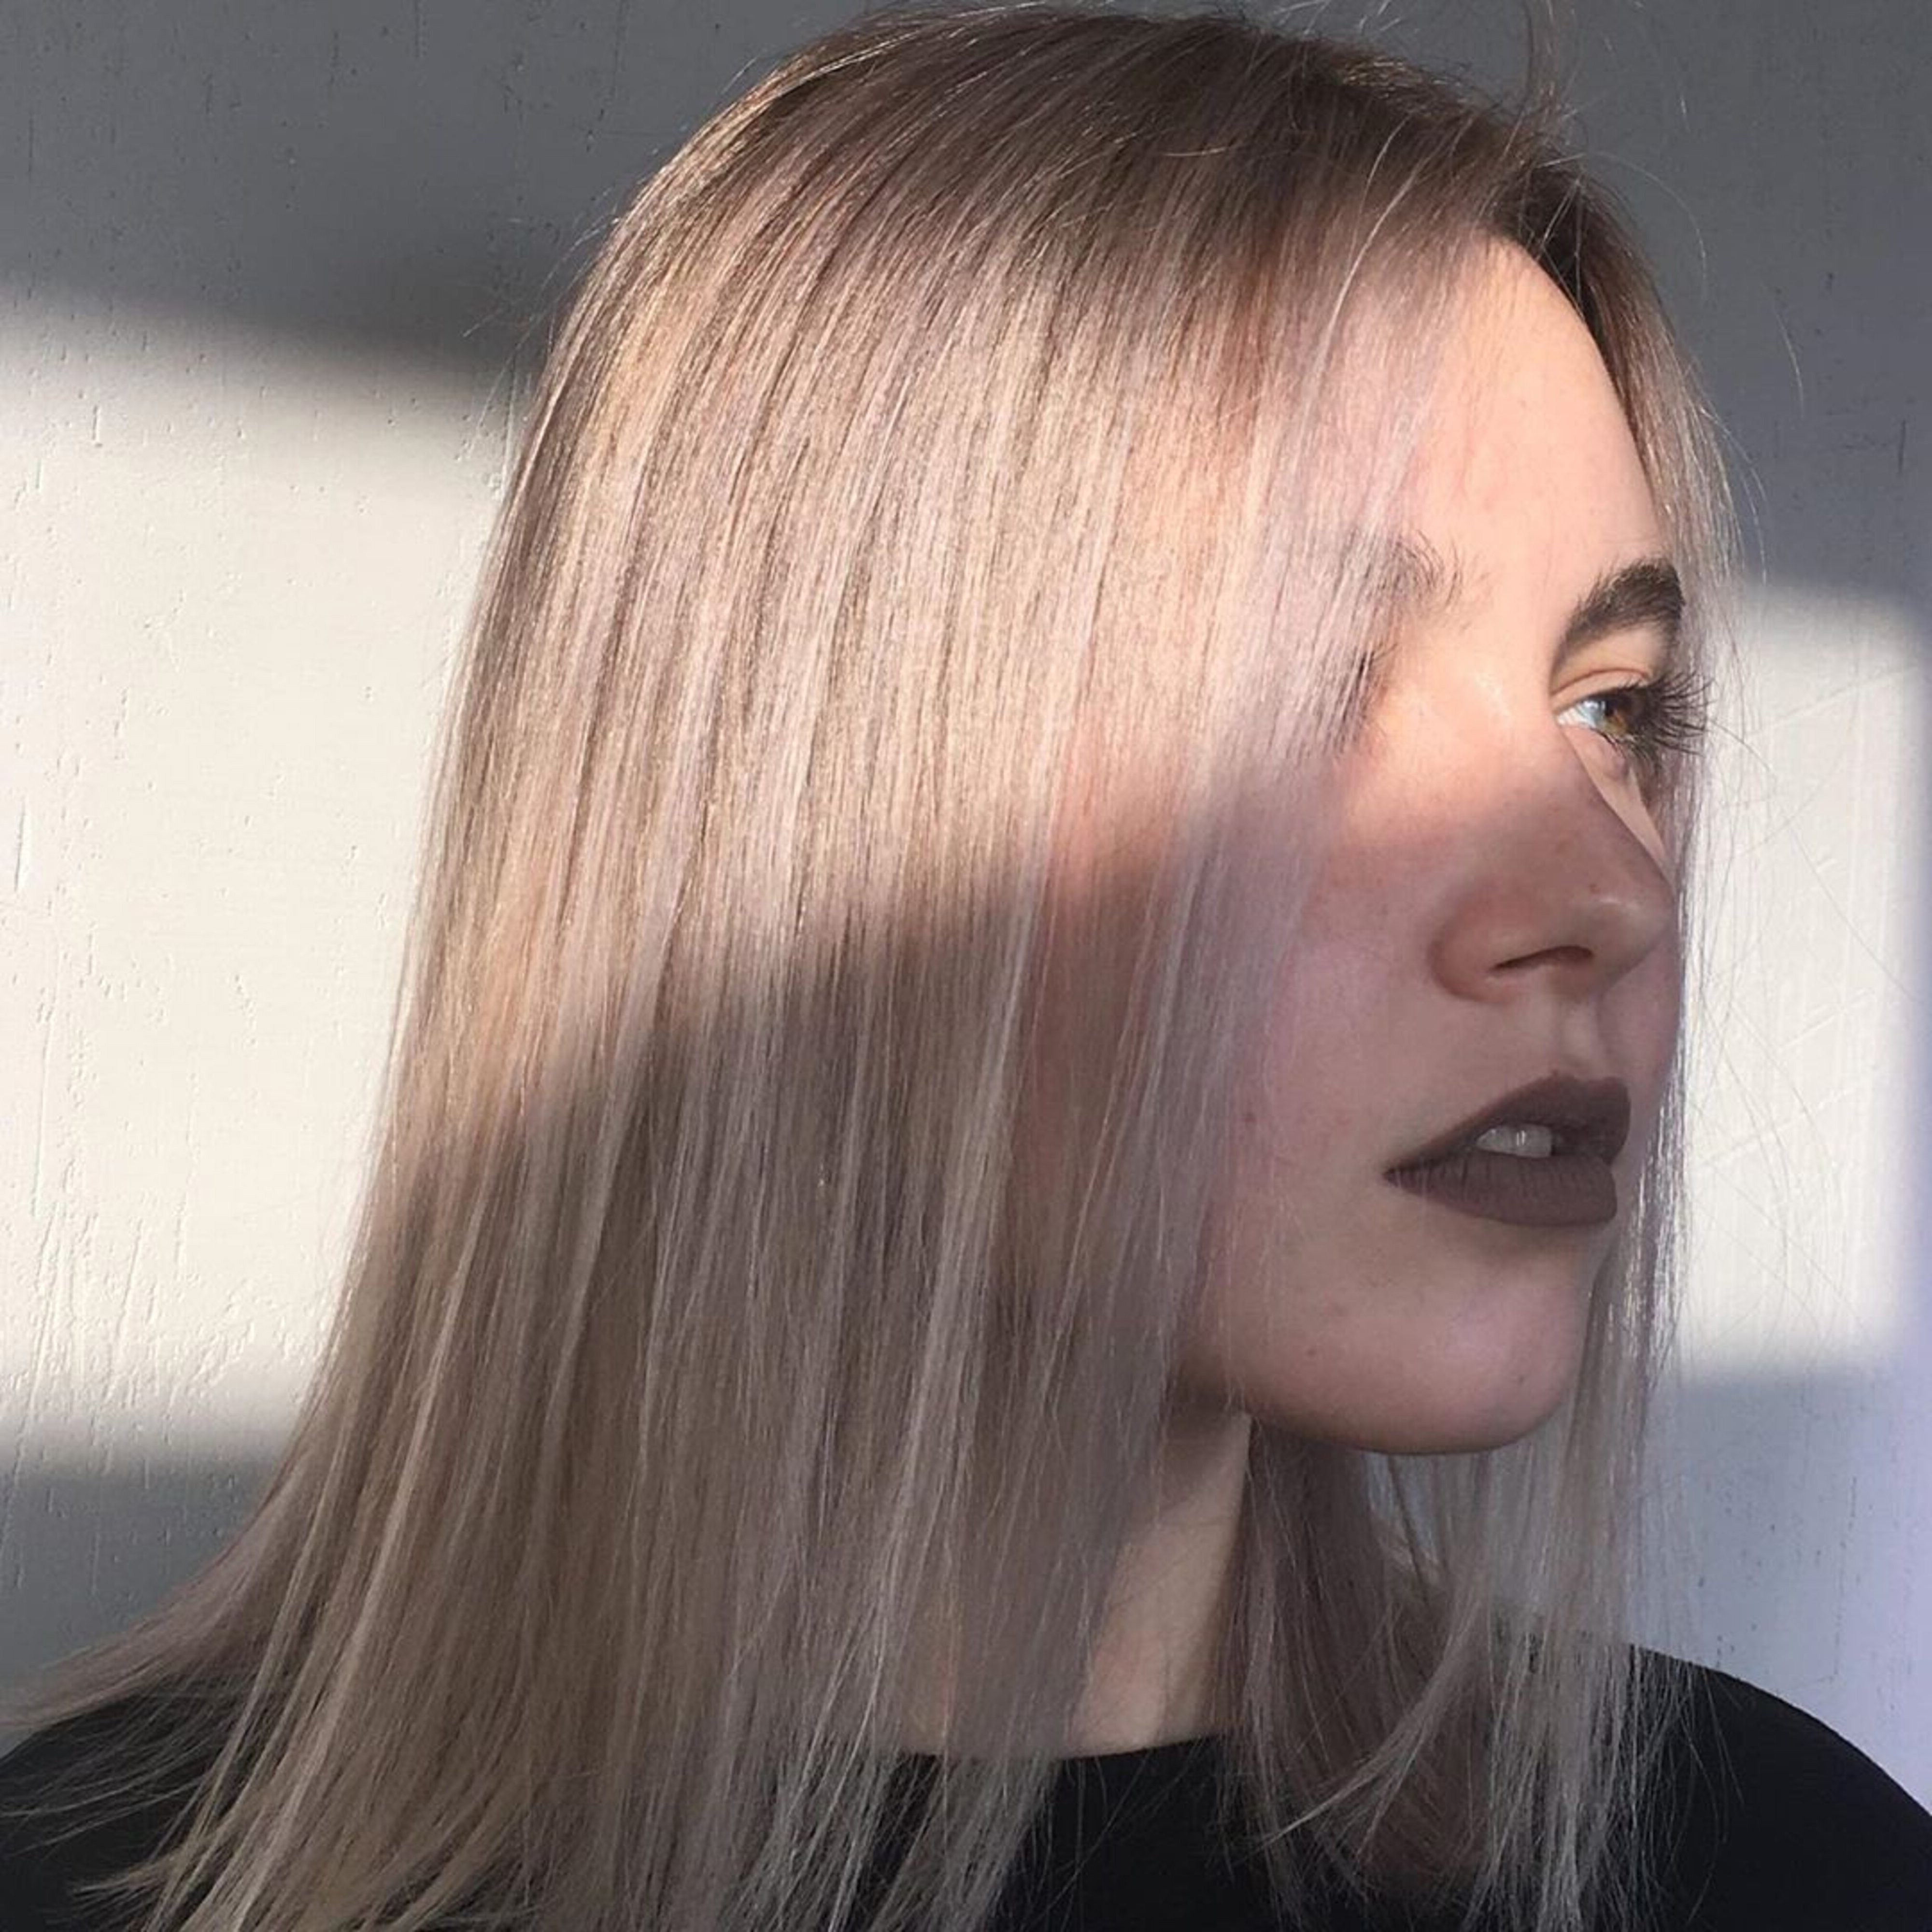 A bob cut for straight hair type.